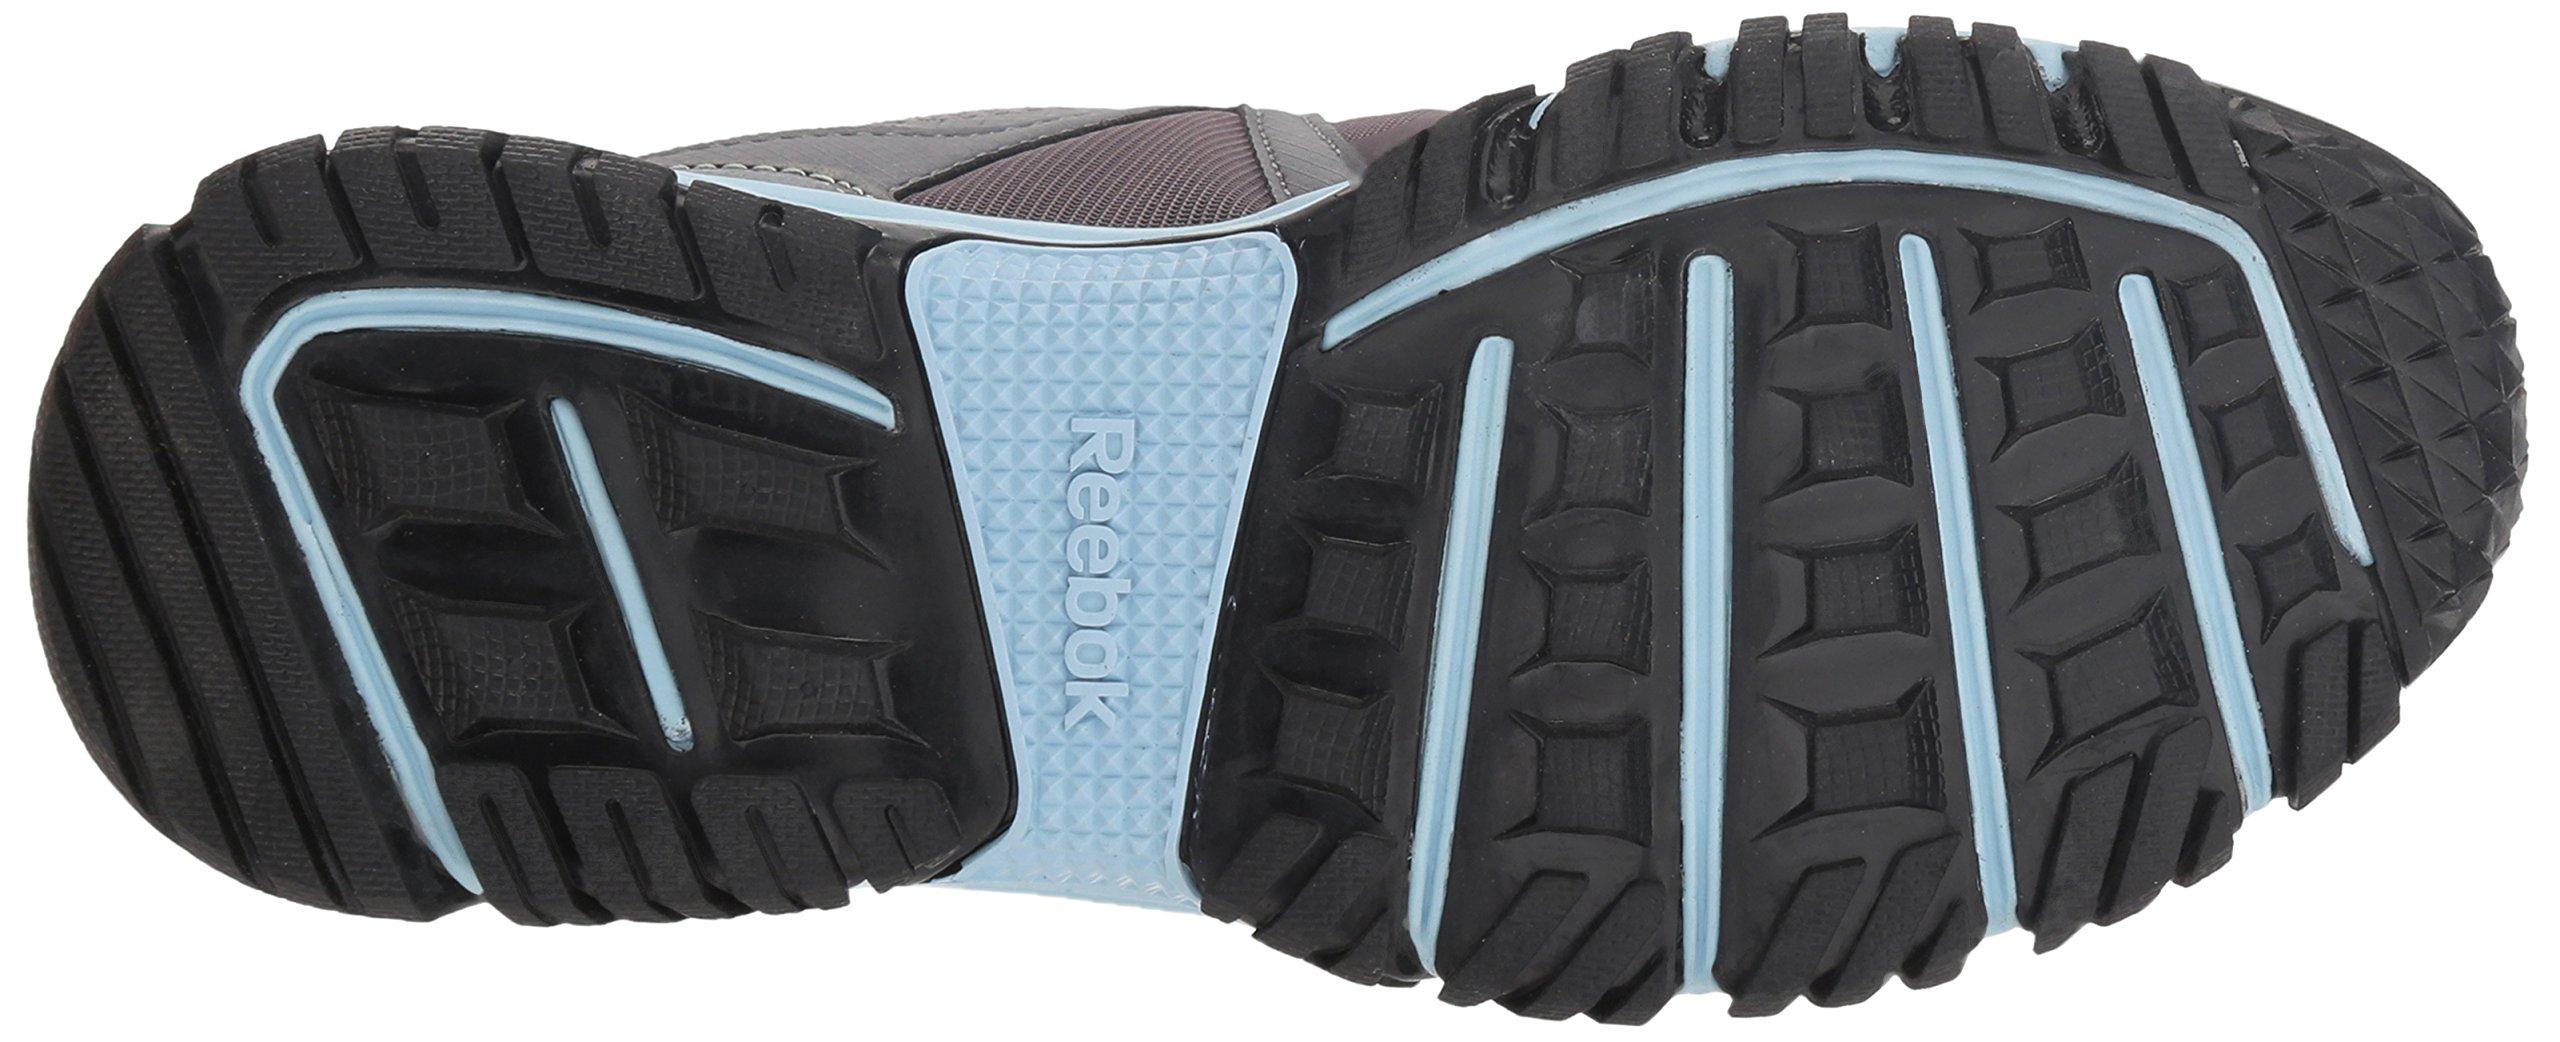 Reebok Women's Ridgerider Trail 3.0 Walking Shoe, ash Grey/Dreamy Blue/blac, 7.5 M US by Reebok (Image #3)